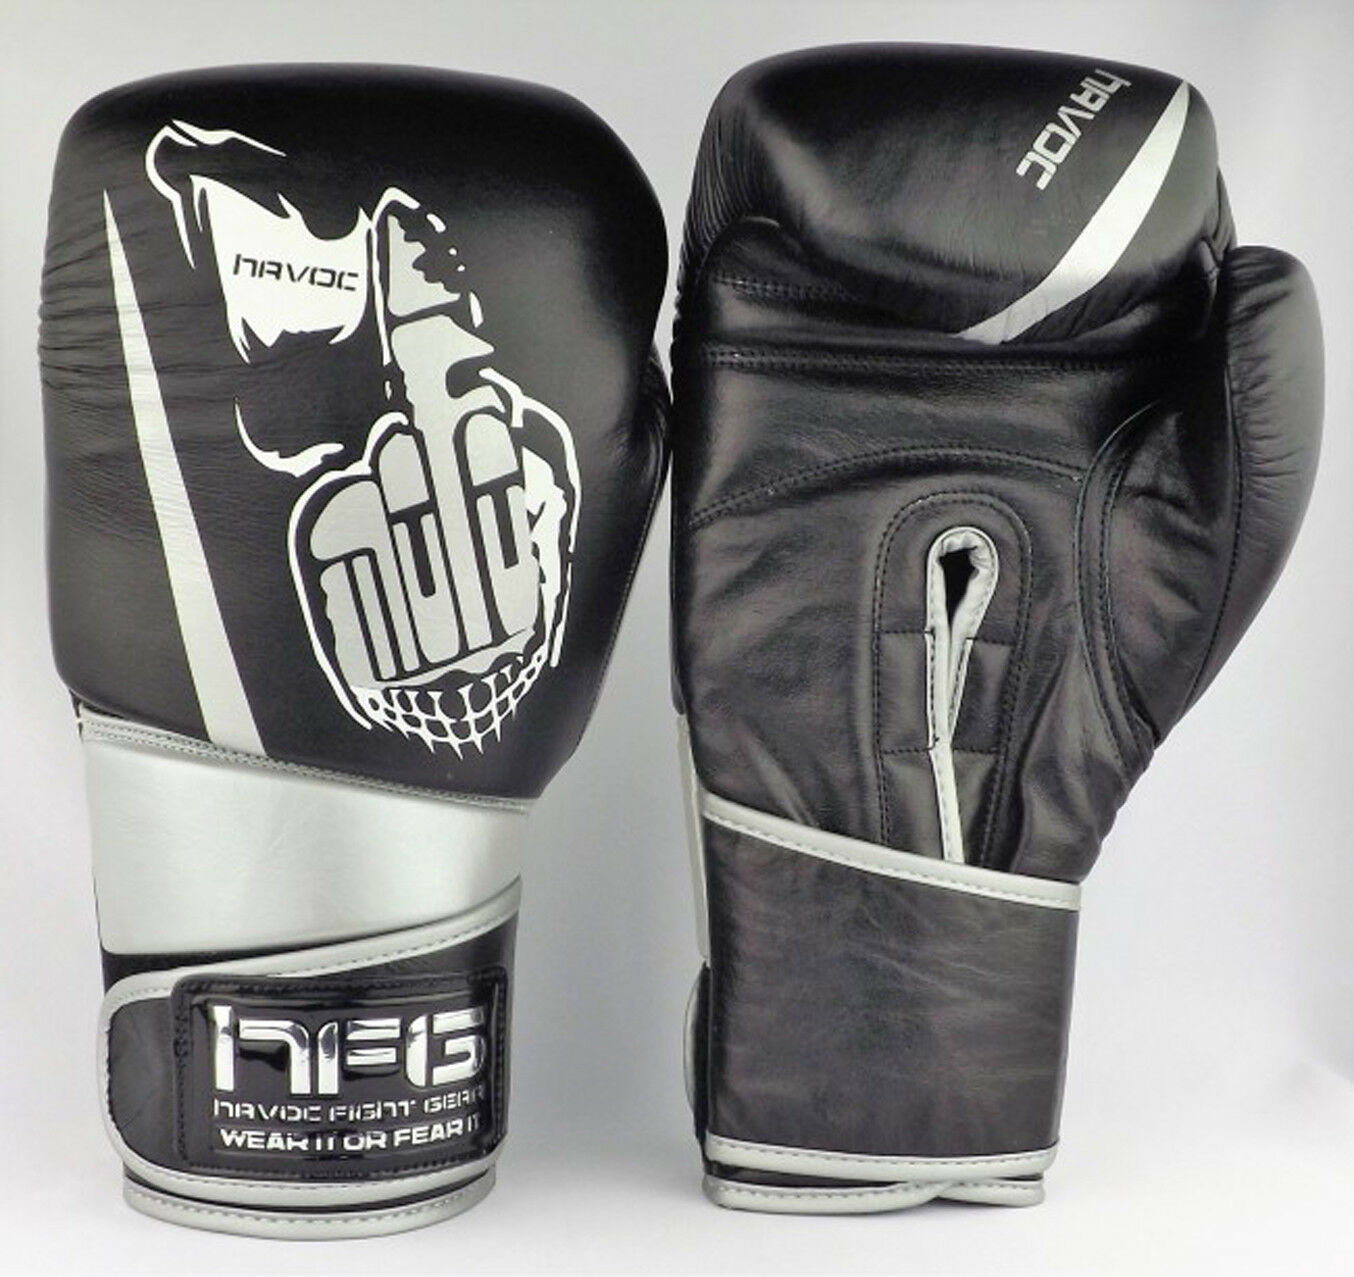 16oz MOFO Leder Premium Boxing Sparring UK Gloves Havoc UK Sparring Boxing Gloves Muaythai e19c45